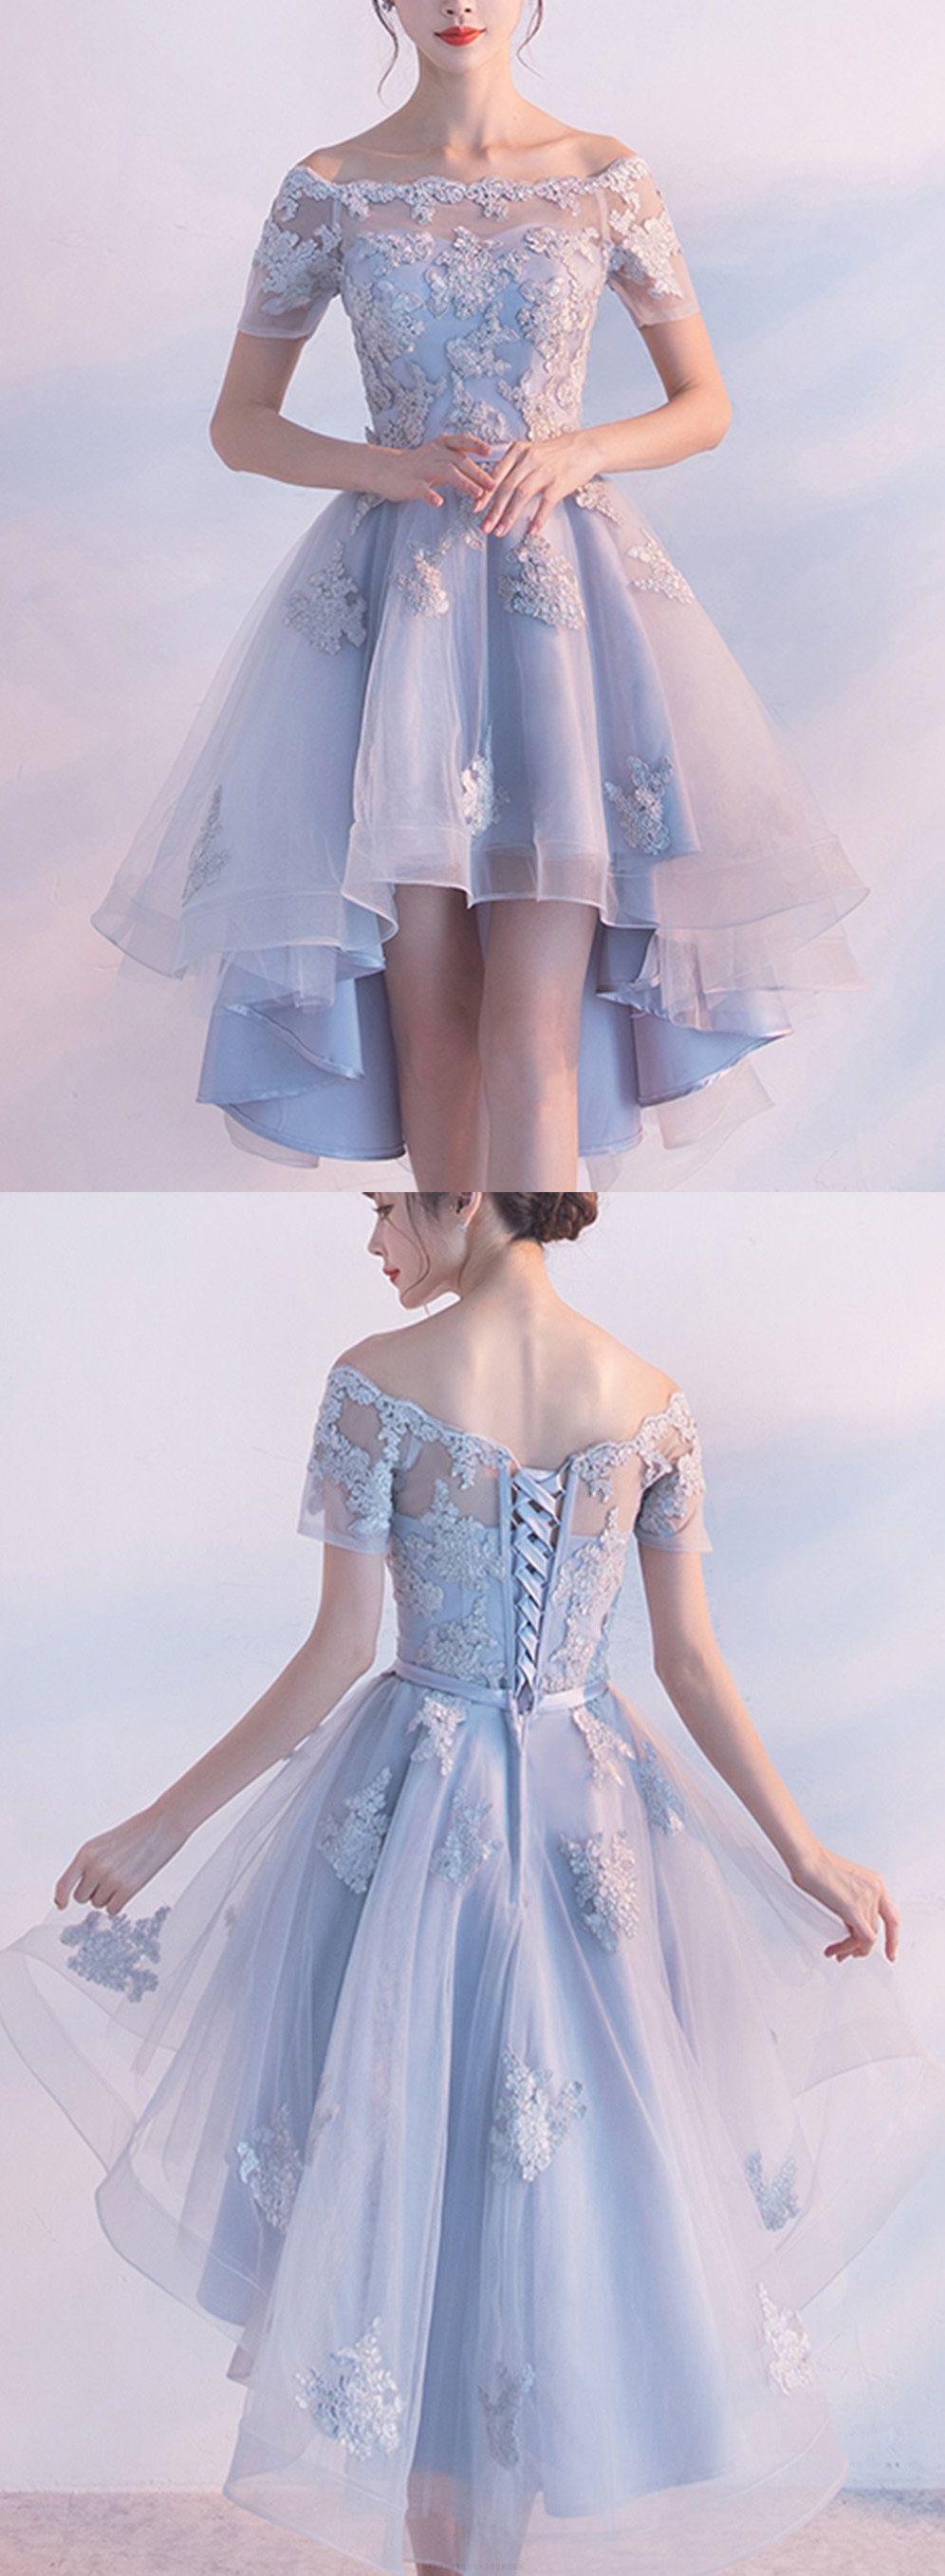 Bandage homecoming dresses light blue alineprincess homecoming